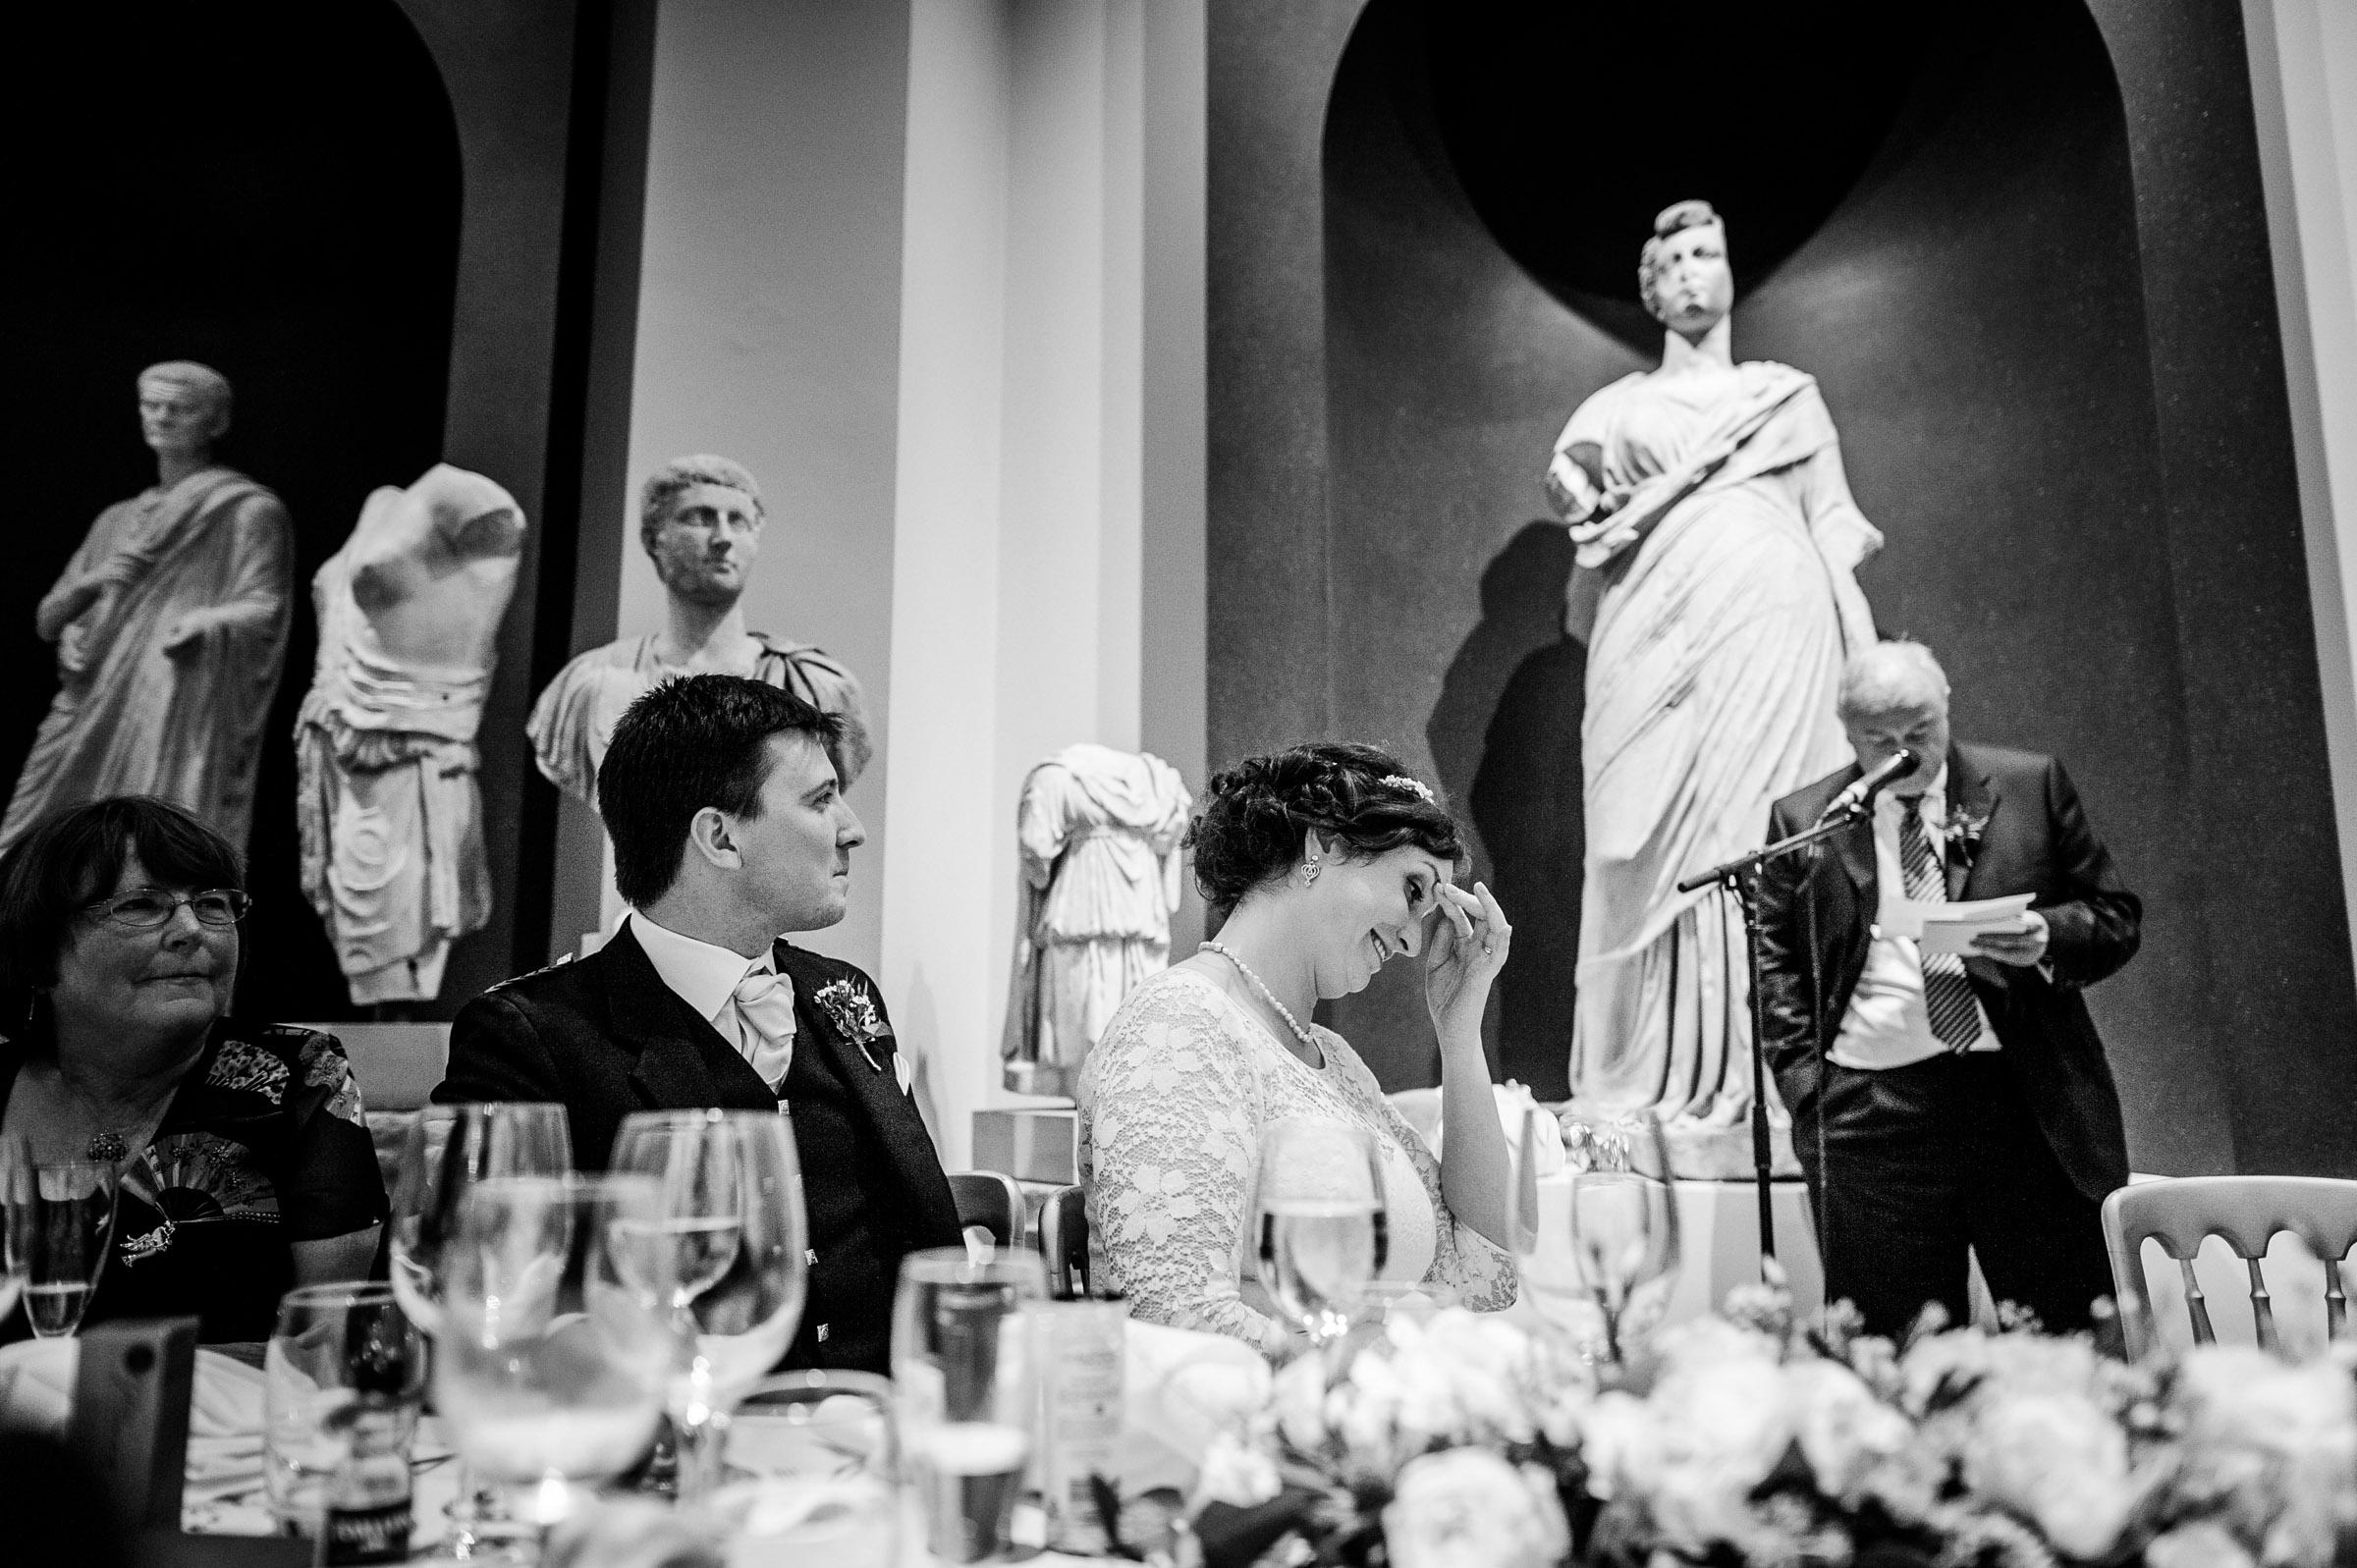 Ashmolean-Museum-Wedding-Pictures-0063.jpg